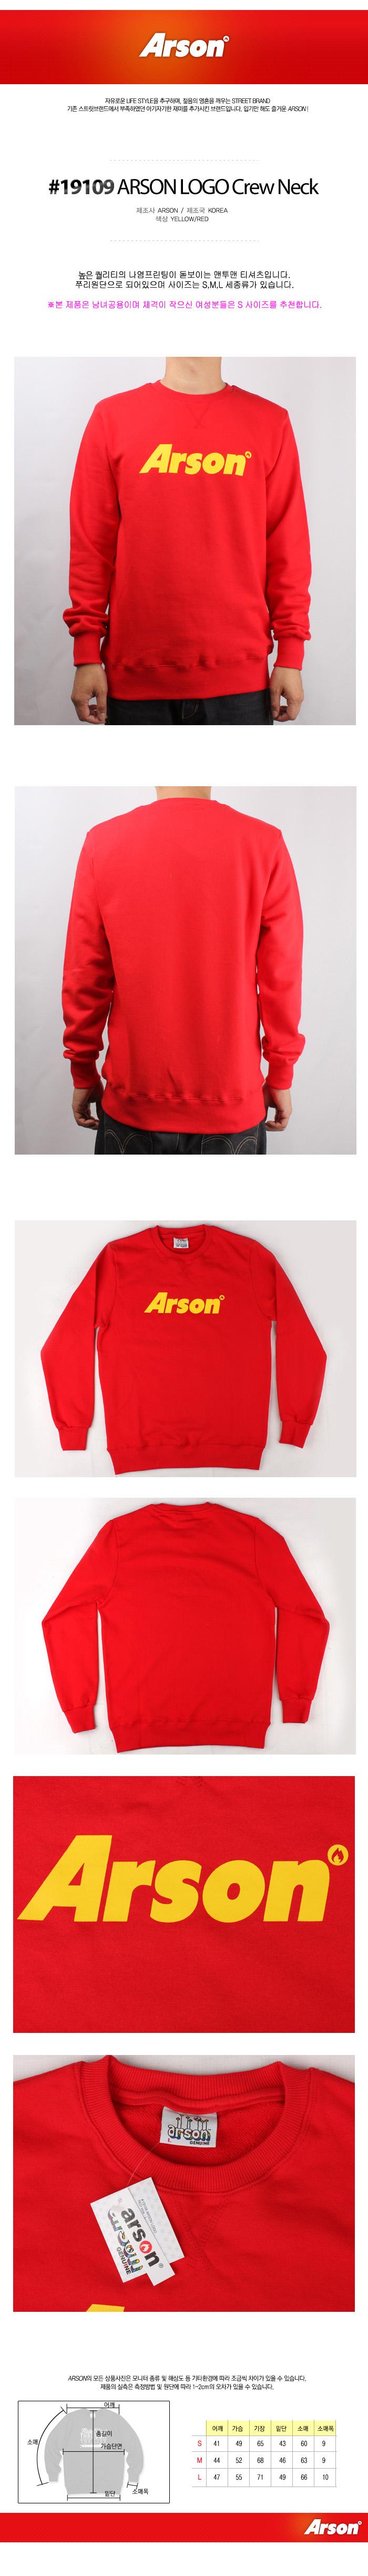 [ ARSON ] [ARSON] 19109 LOGO CREW NECK (Red)